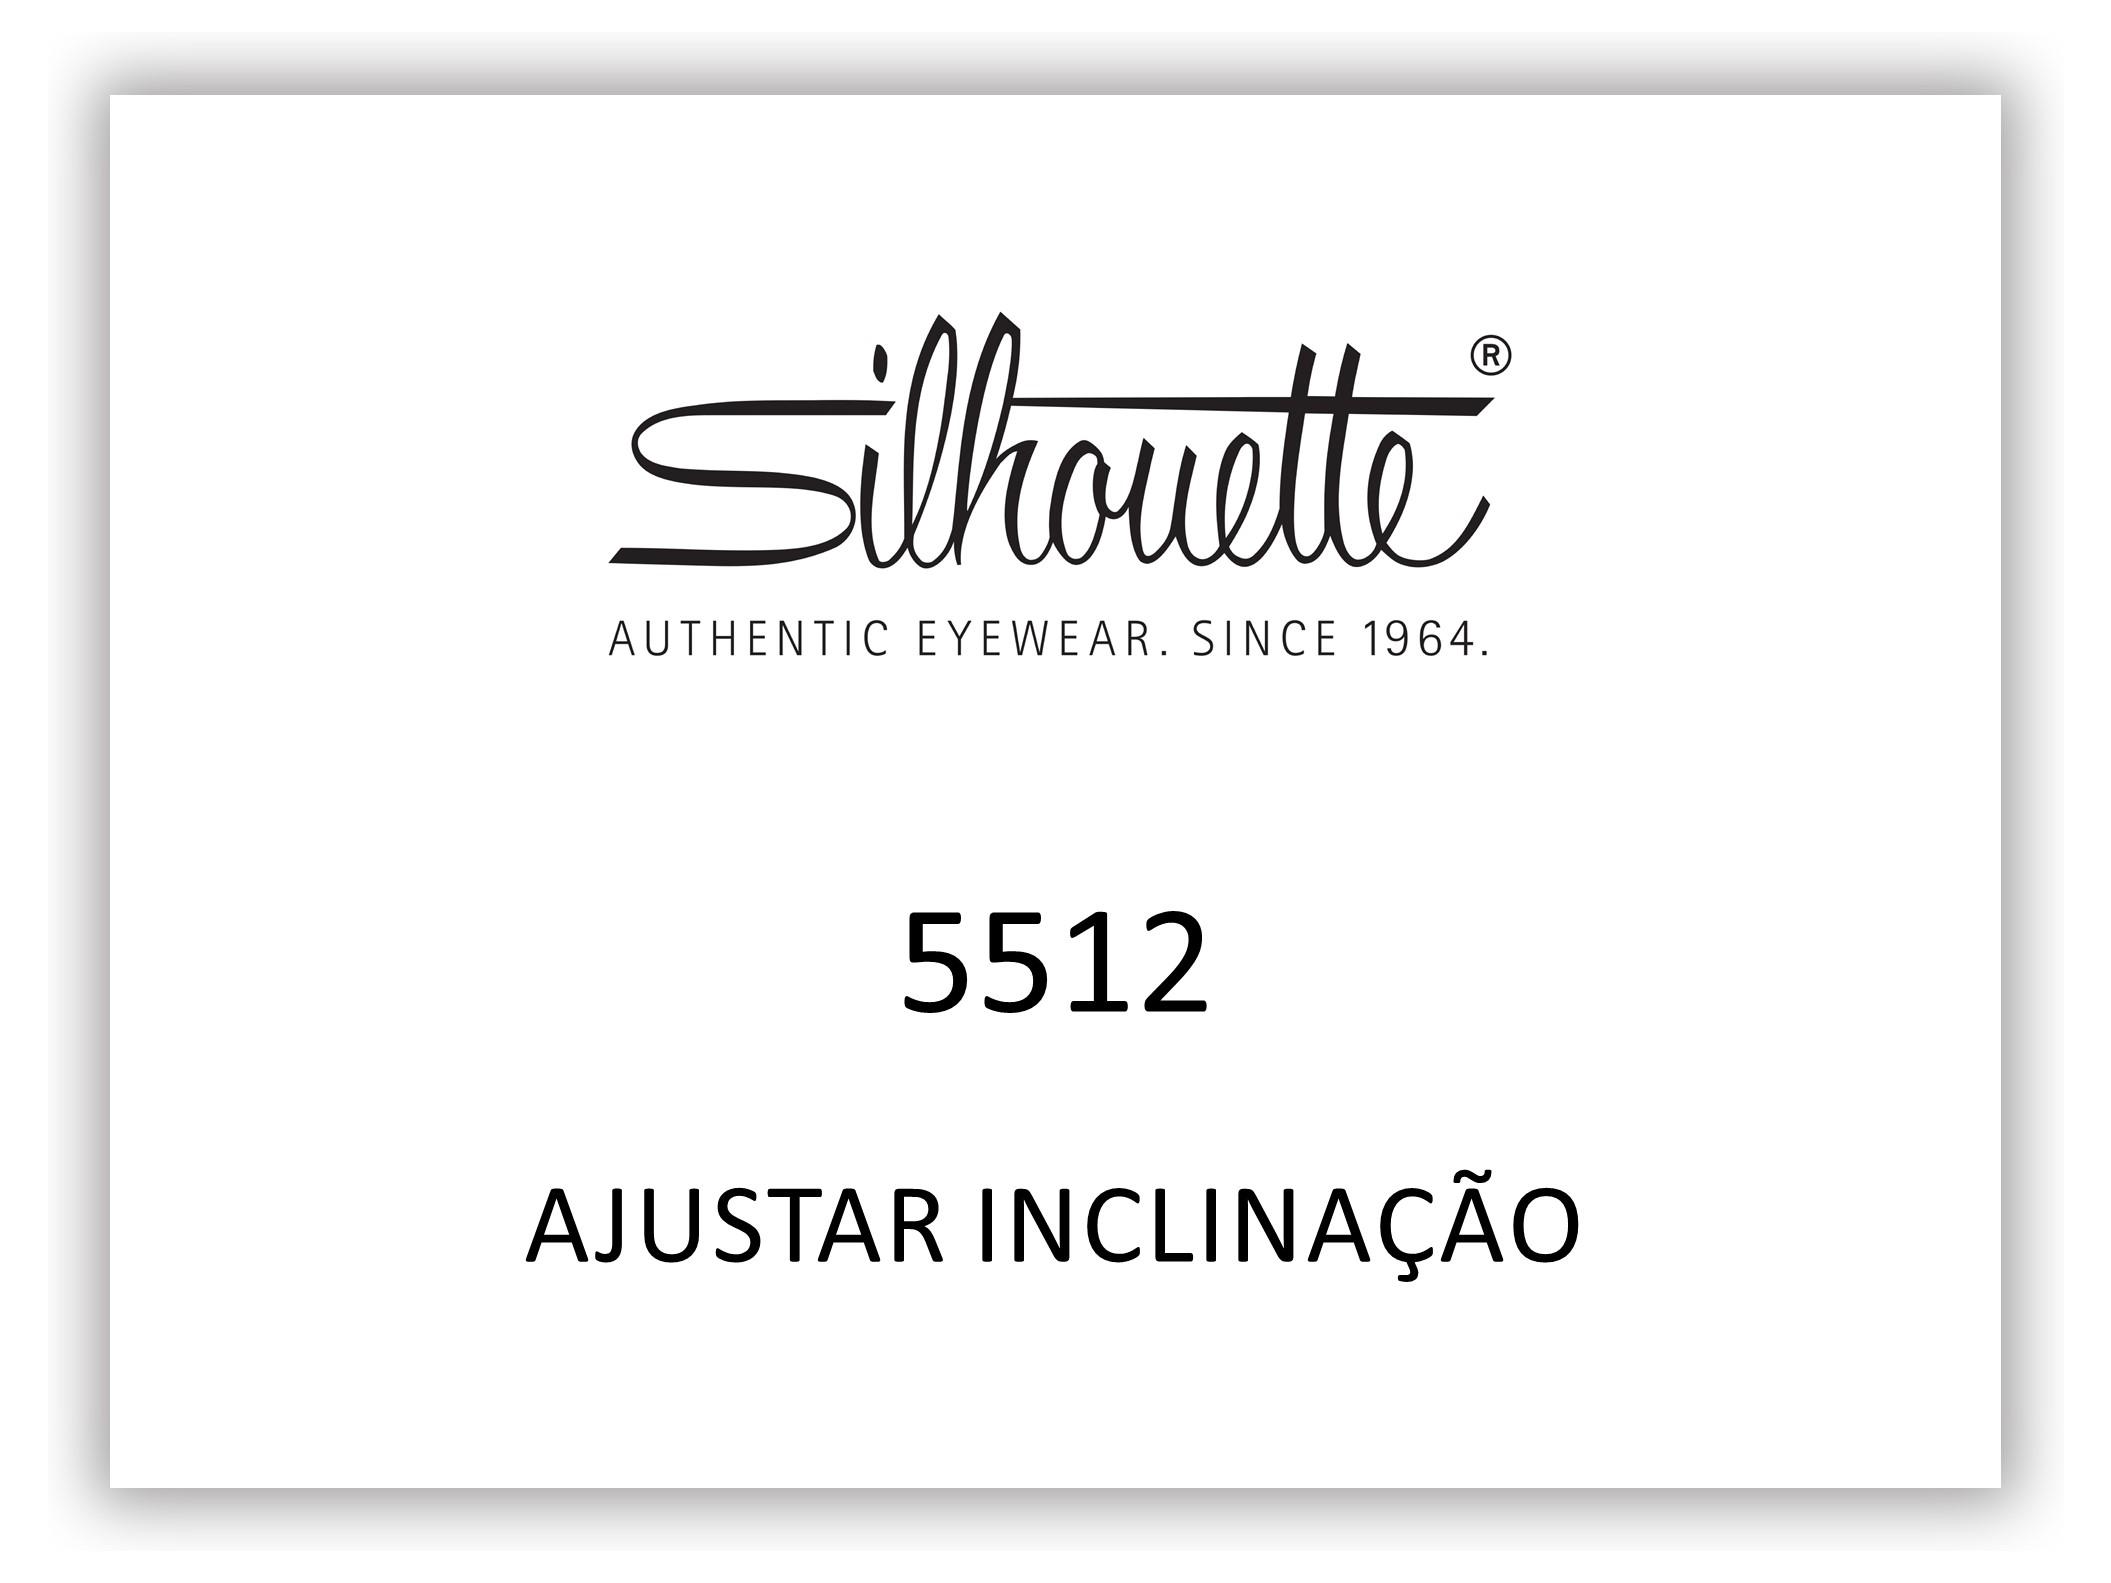 5512-INC